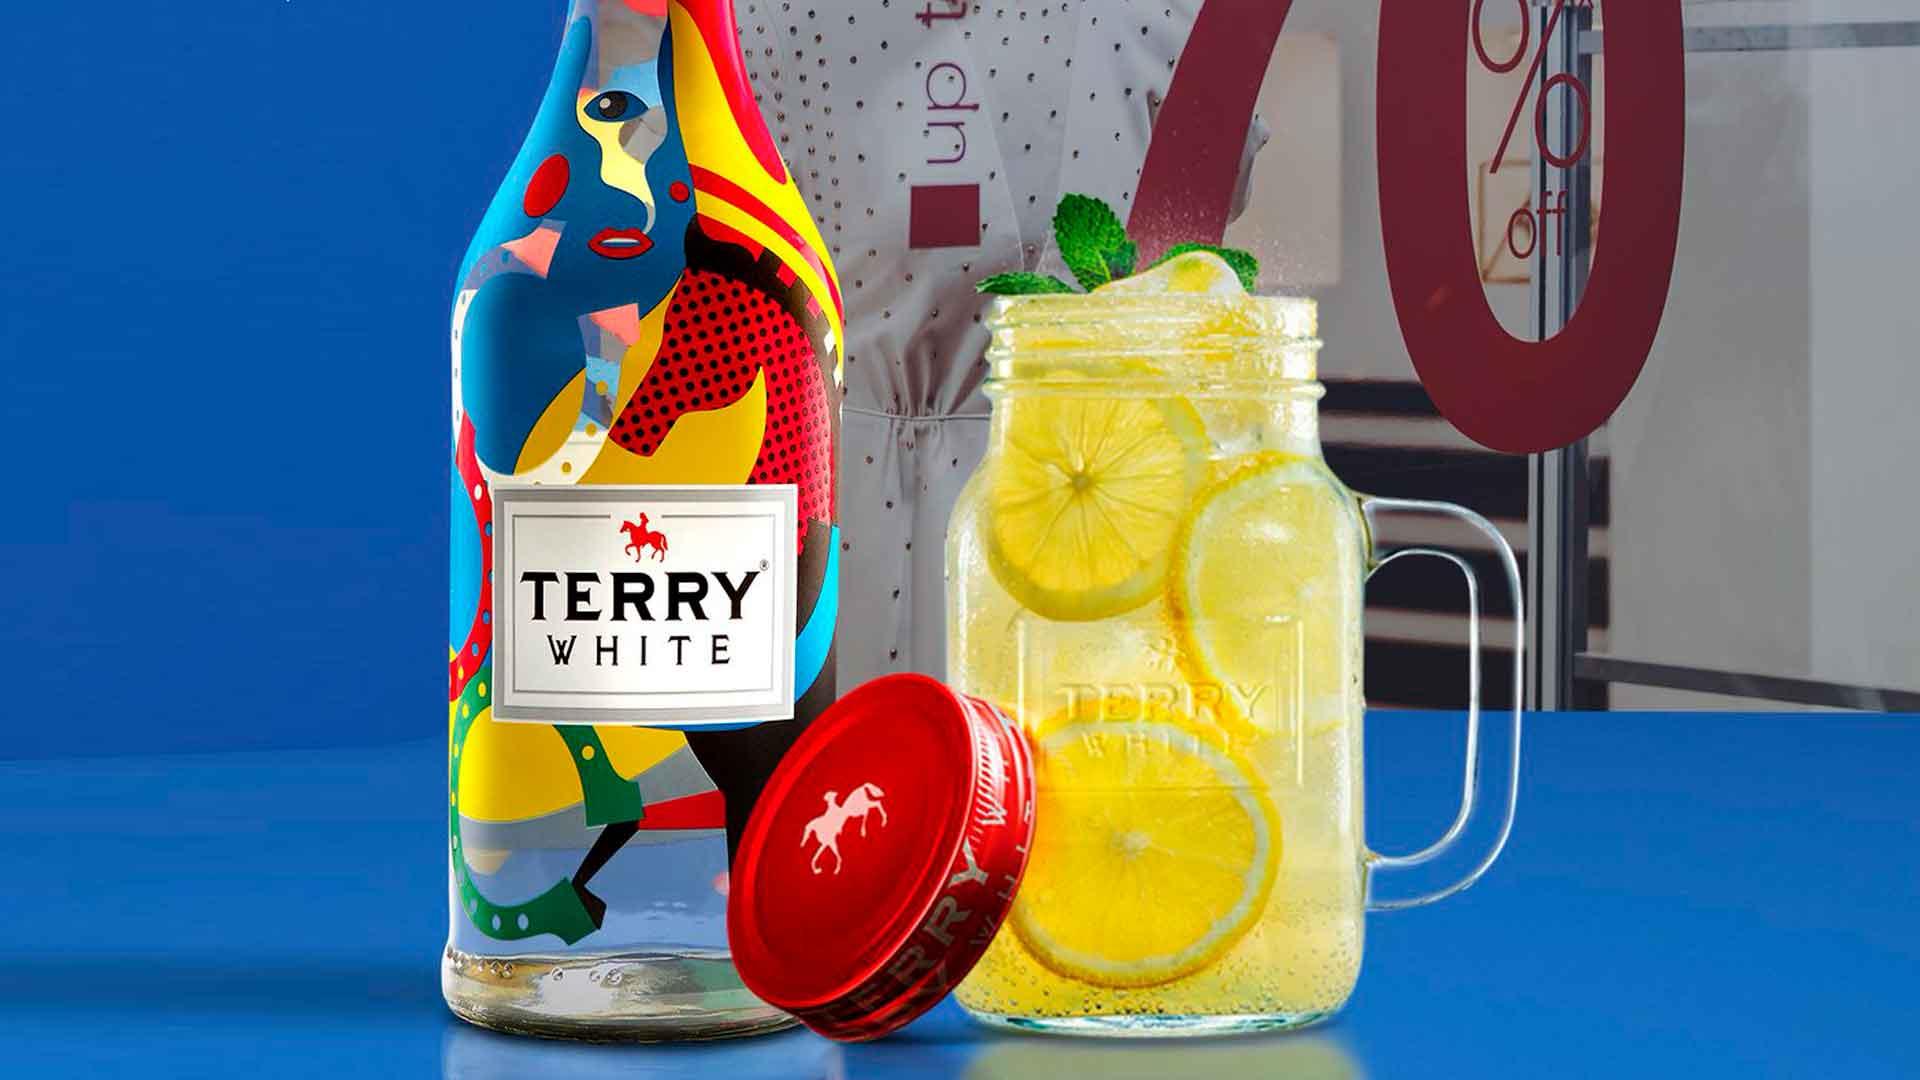 Terry White: el primer brandy blanco